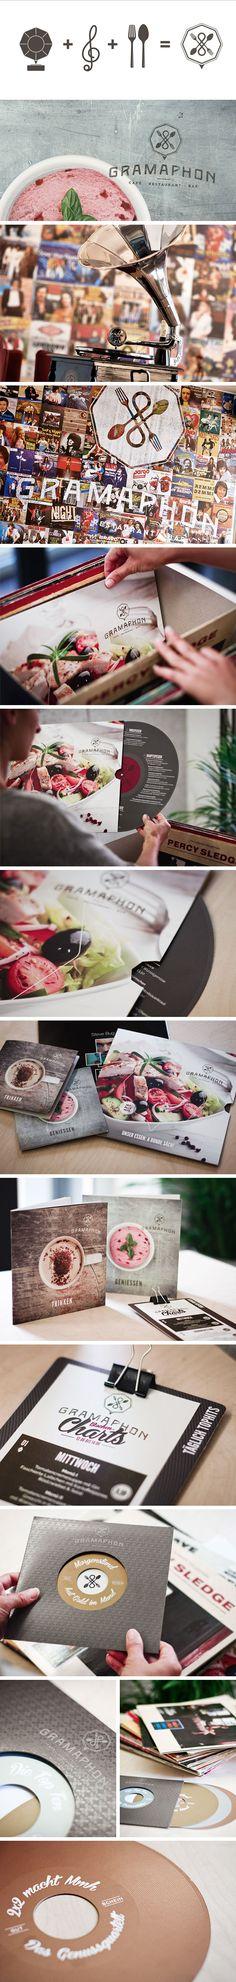 Kunde: Gramaphon, Branding, Grafikdesign - Werbeagentur Fredmansky